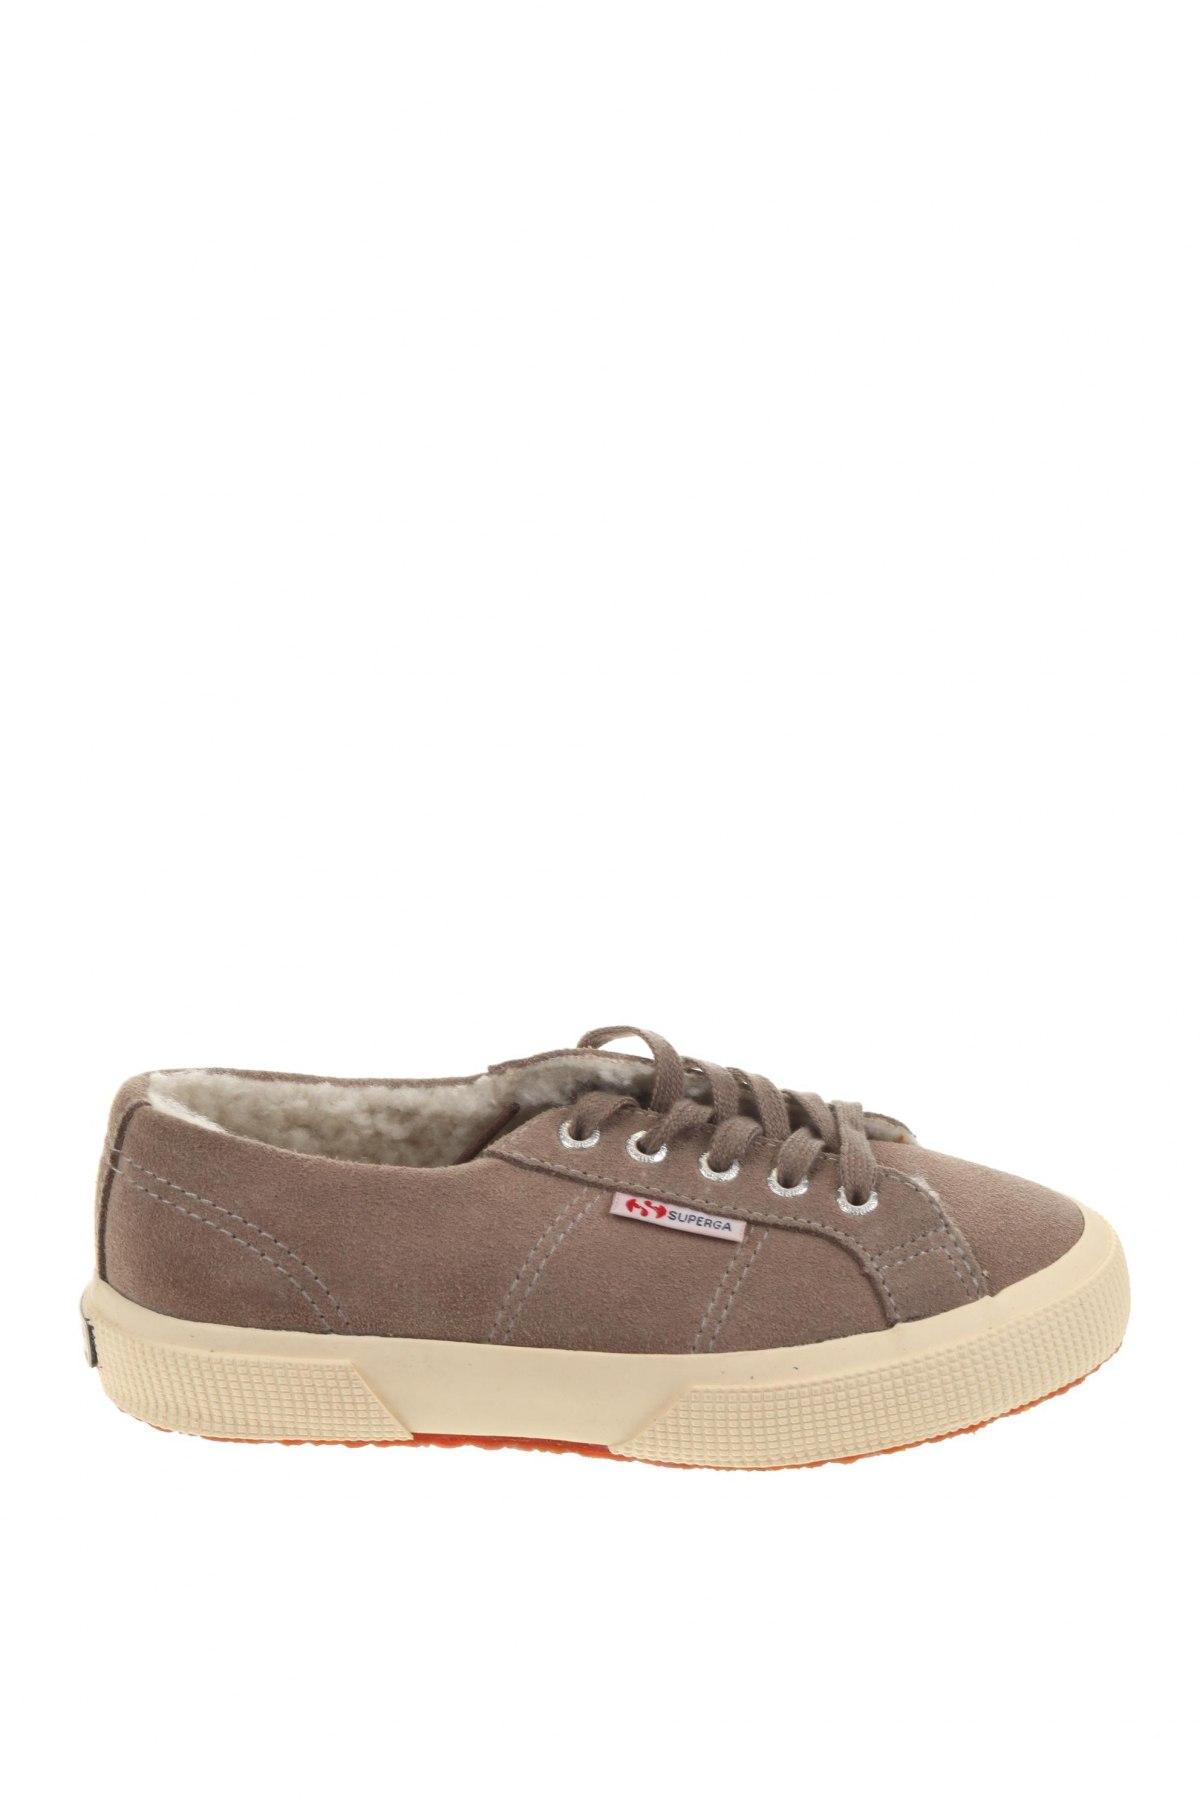 Детски обувки Superga, Размер 31, Цвят Сив, Естествен велур, Цена 66,75лв.